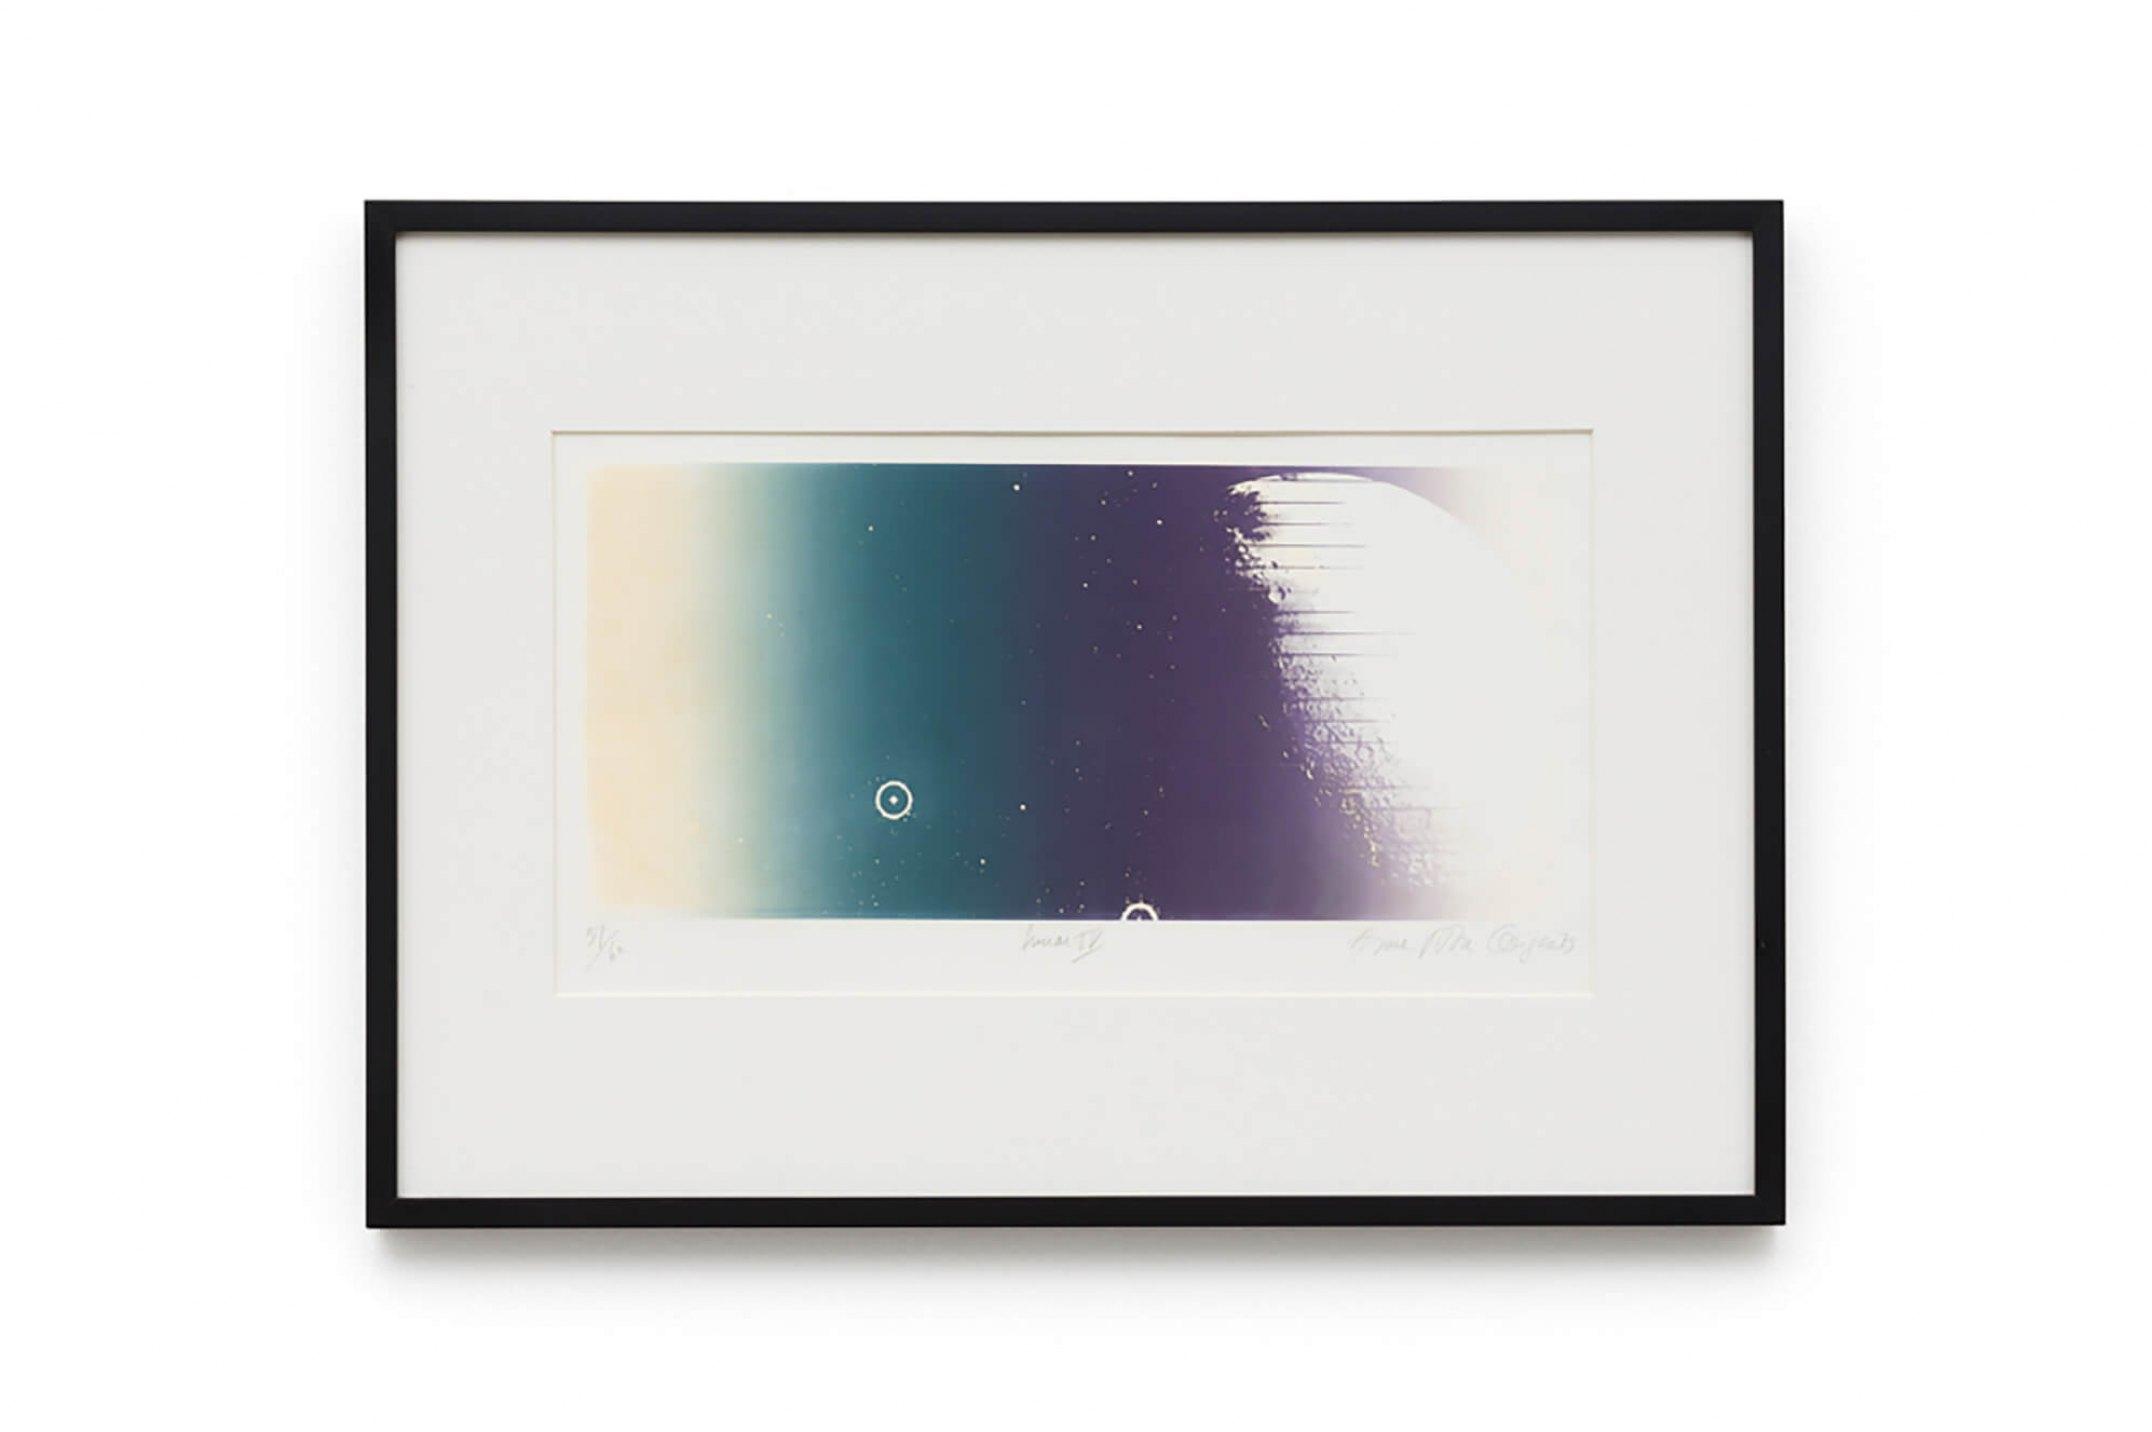 Anna Bella Geiger,<em>&nbsp;Lunar IV,&nbsp;</em>1973, photo silkscreen in colors, 51 × 70 cm - Mendes Wood DM